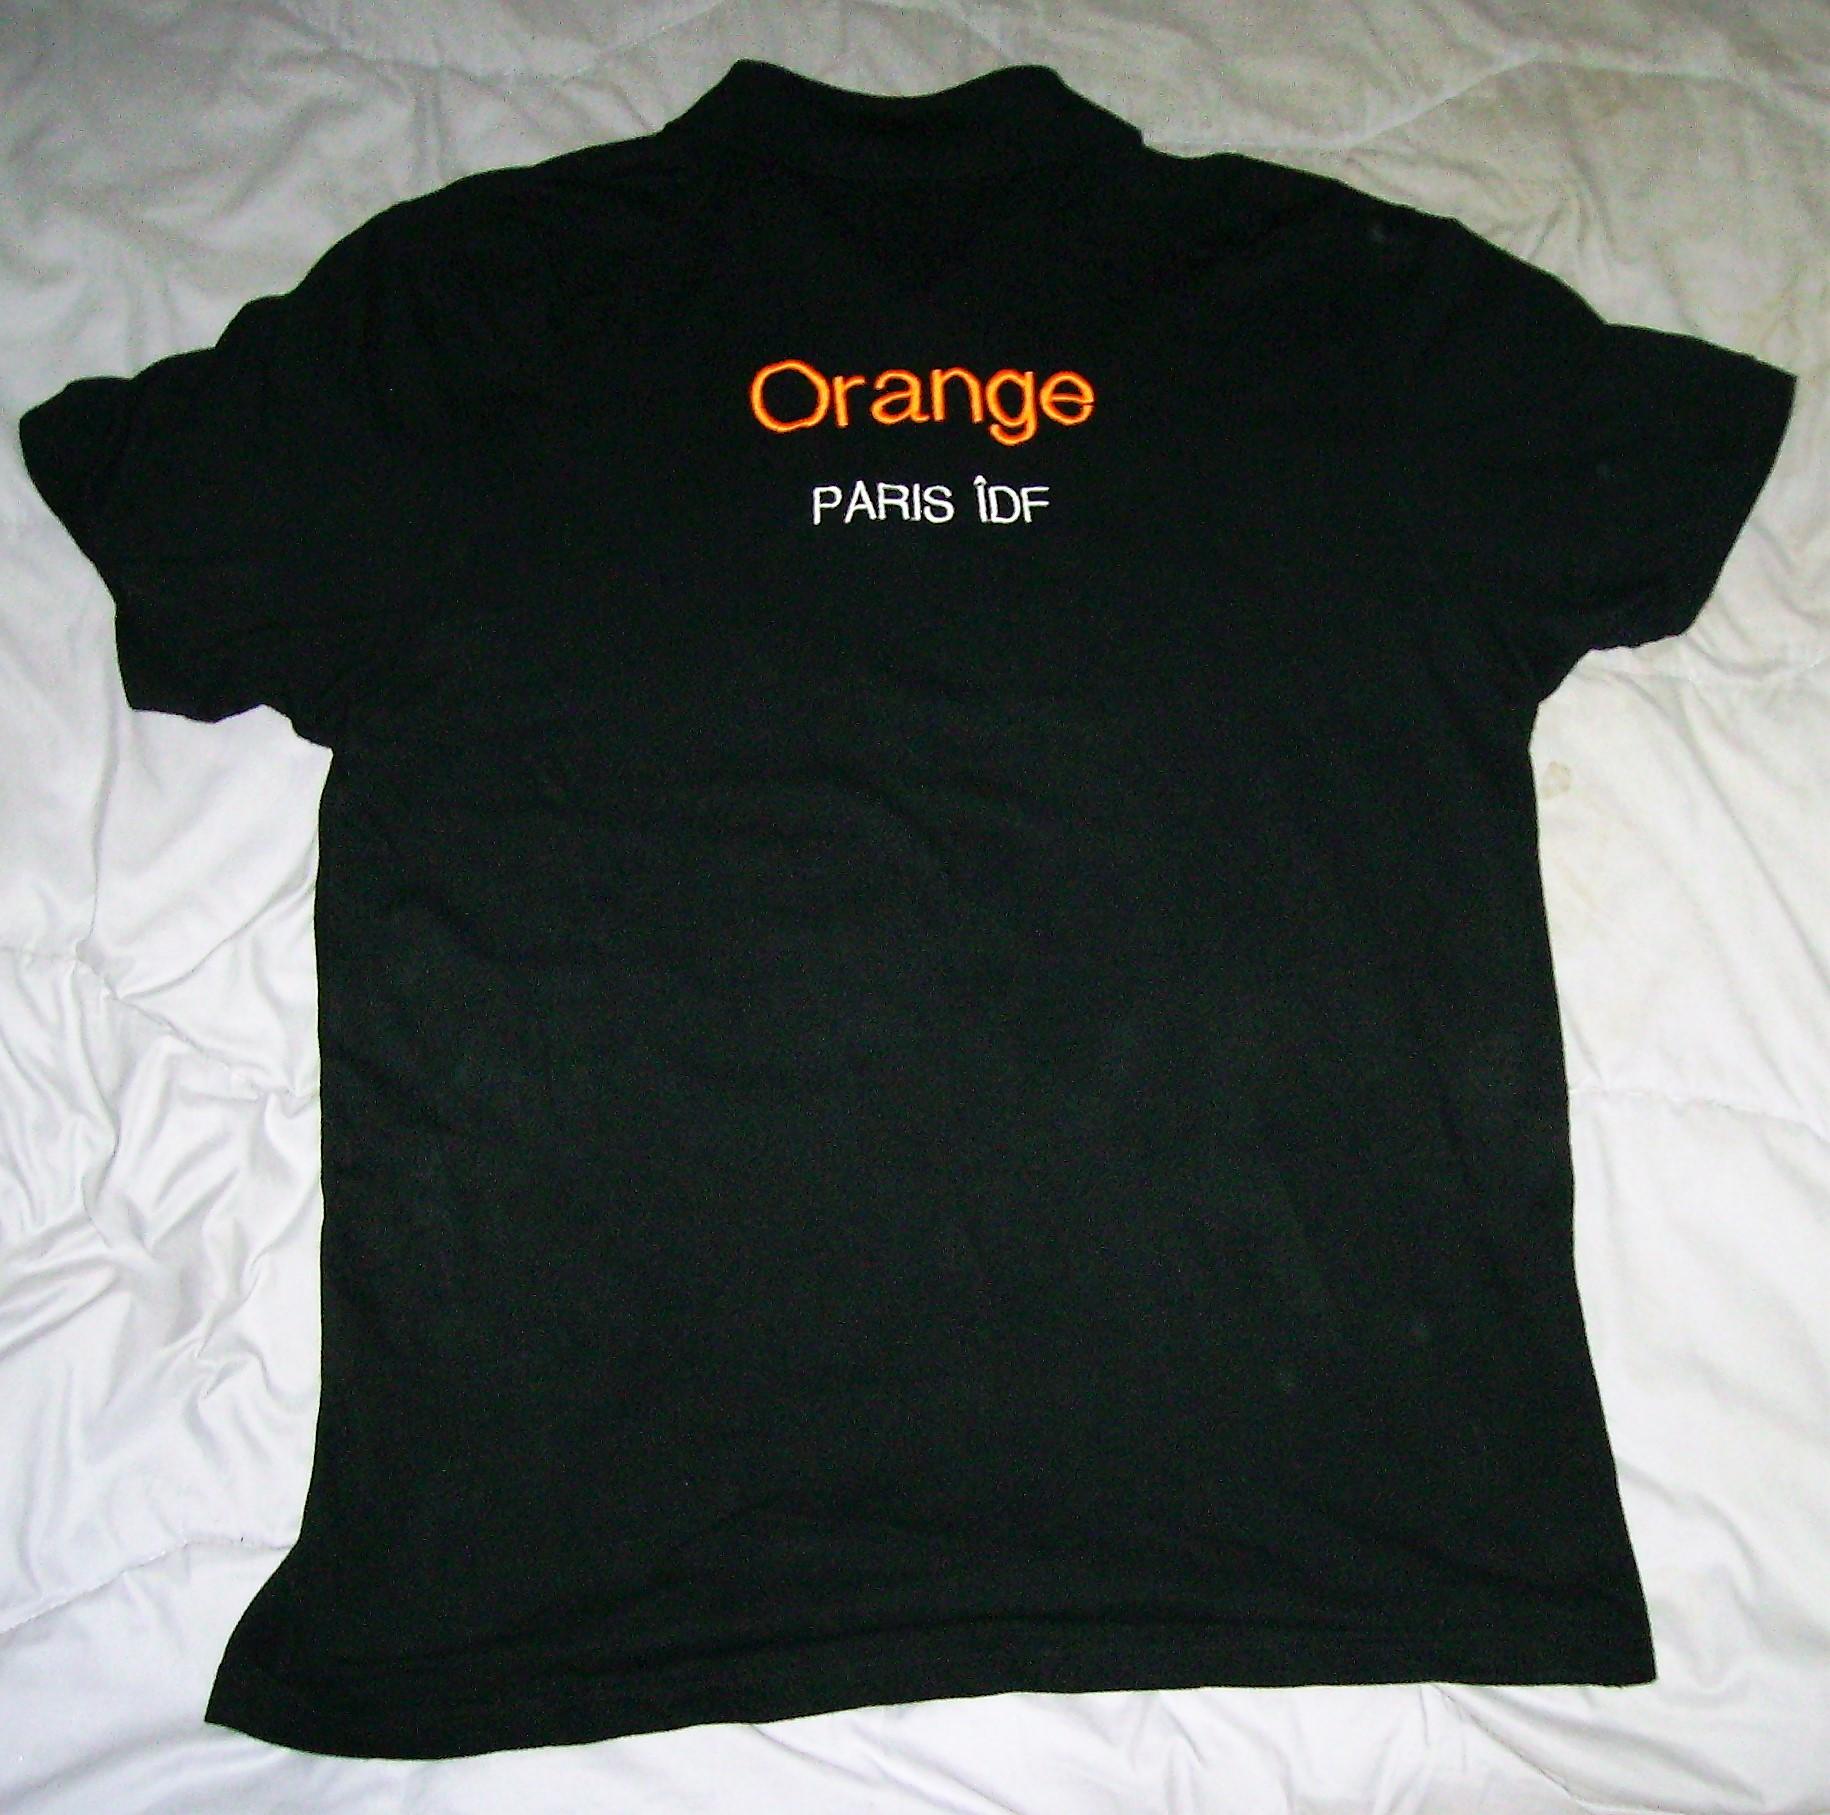 Maillot SE Orange dos.jpg